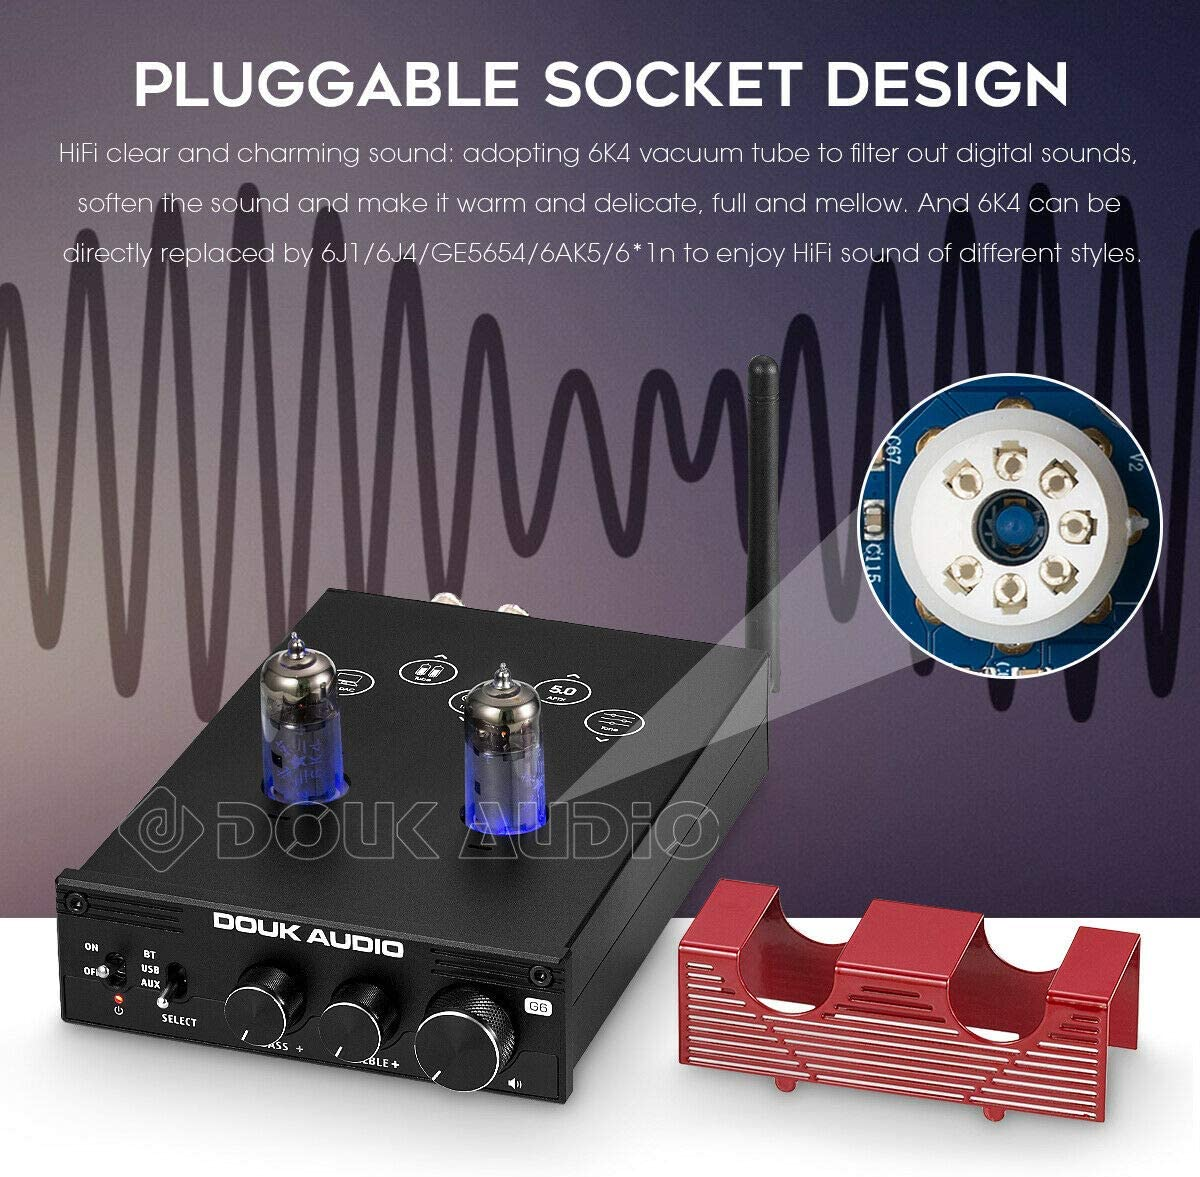 Nobsound Amplificador de tubo HiFi Bluetooth 5.0 al vac/ío est/éreo Tube Amplifier APTX-LL 160W /× 2